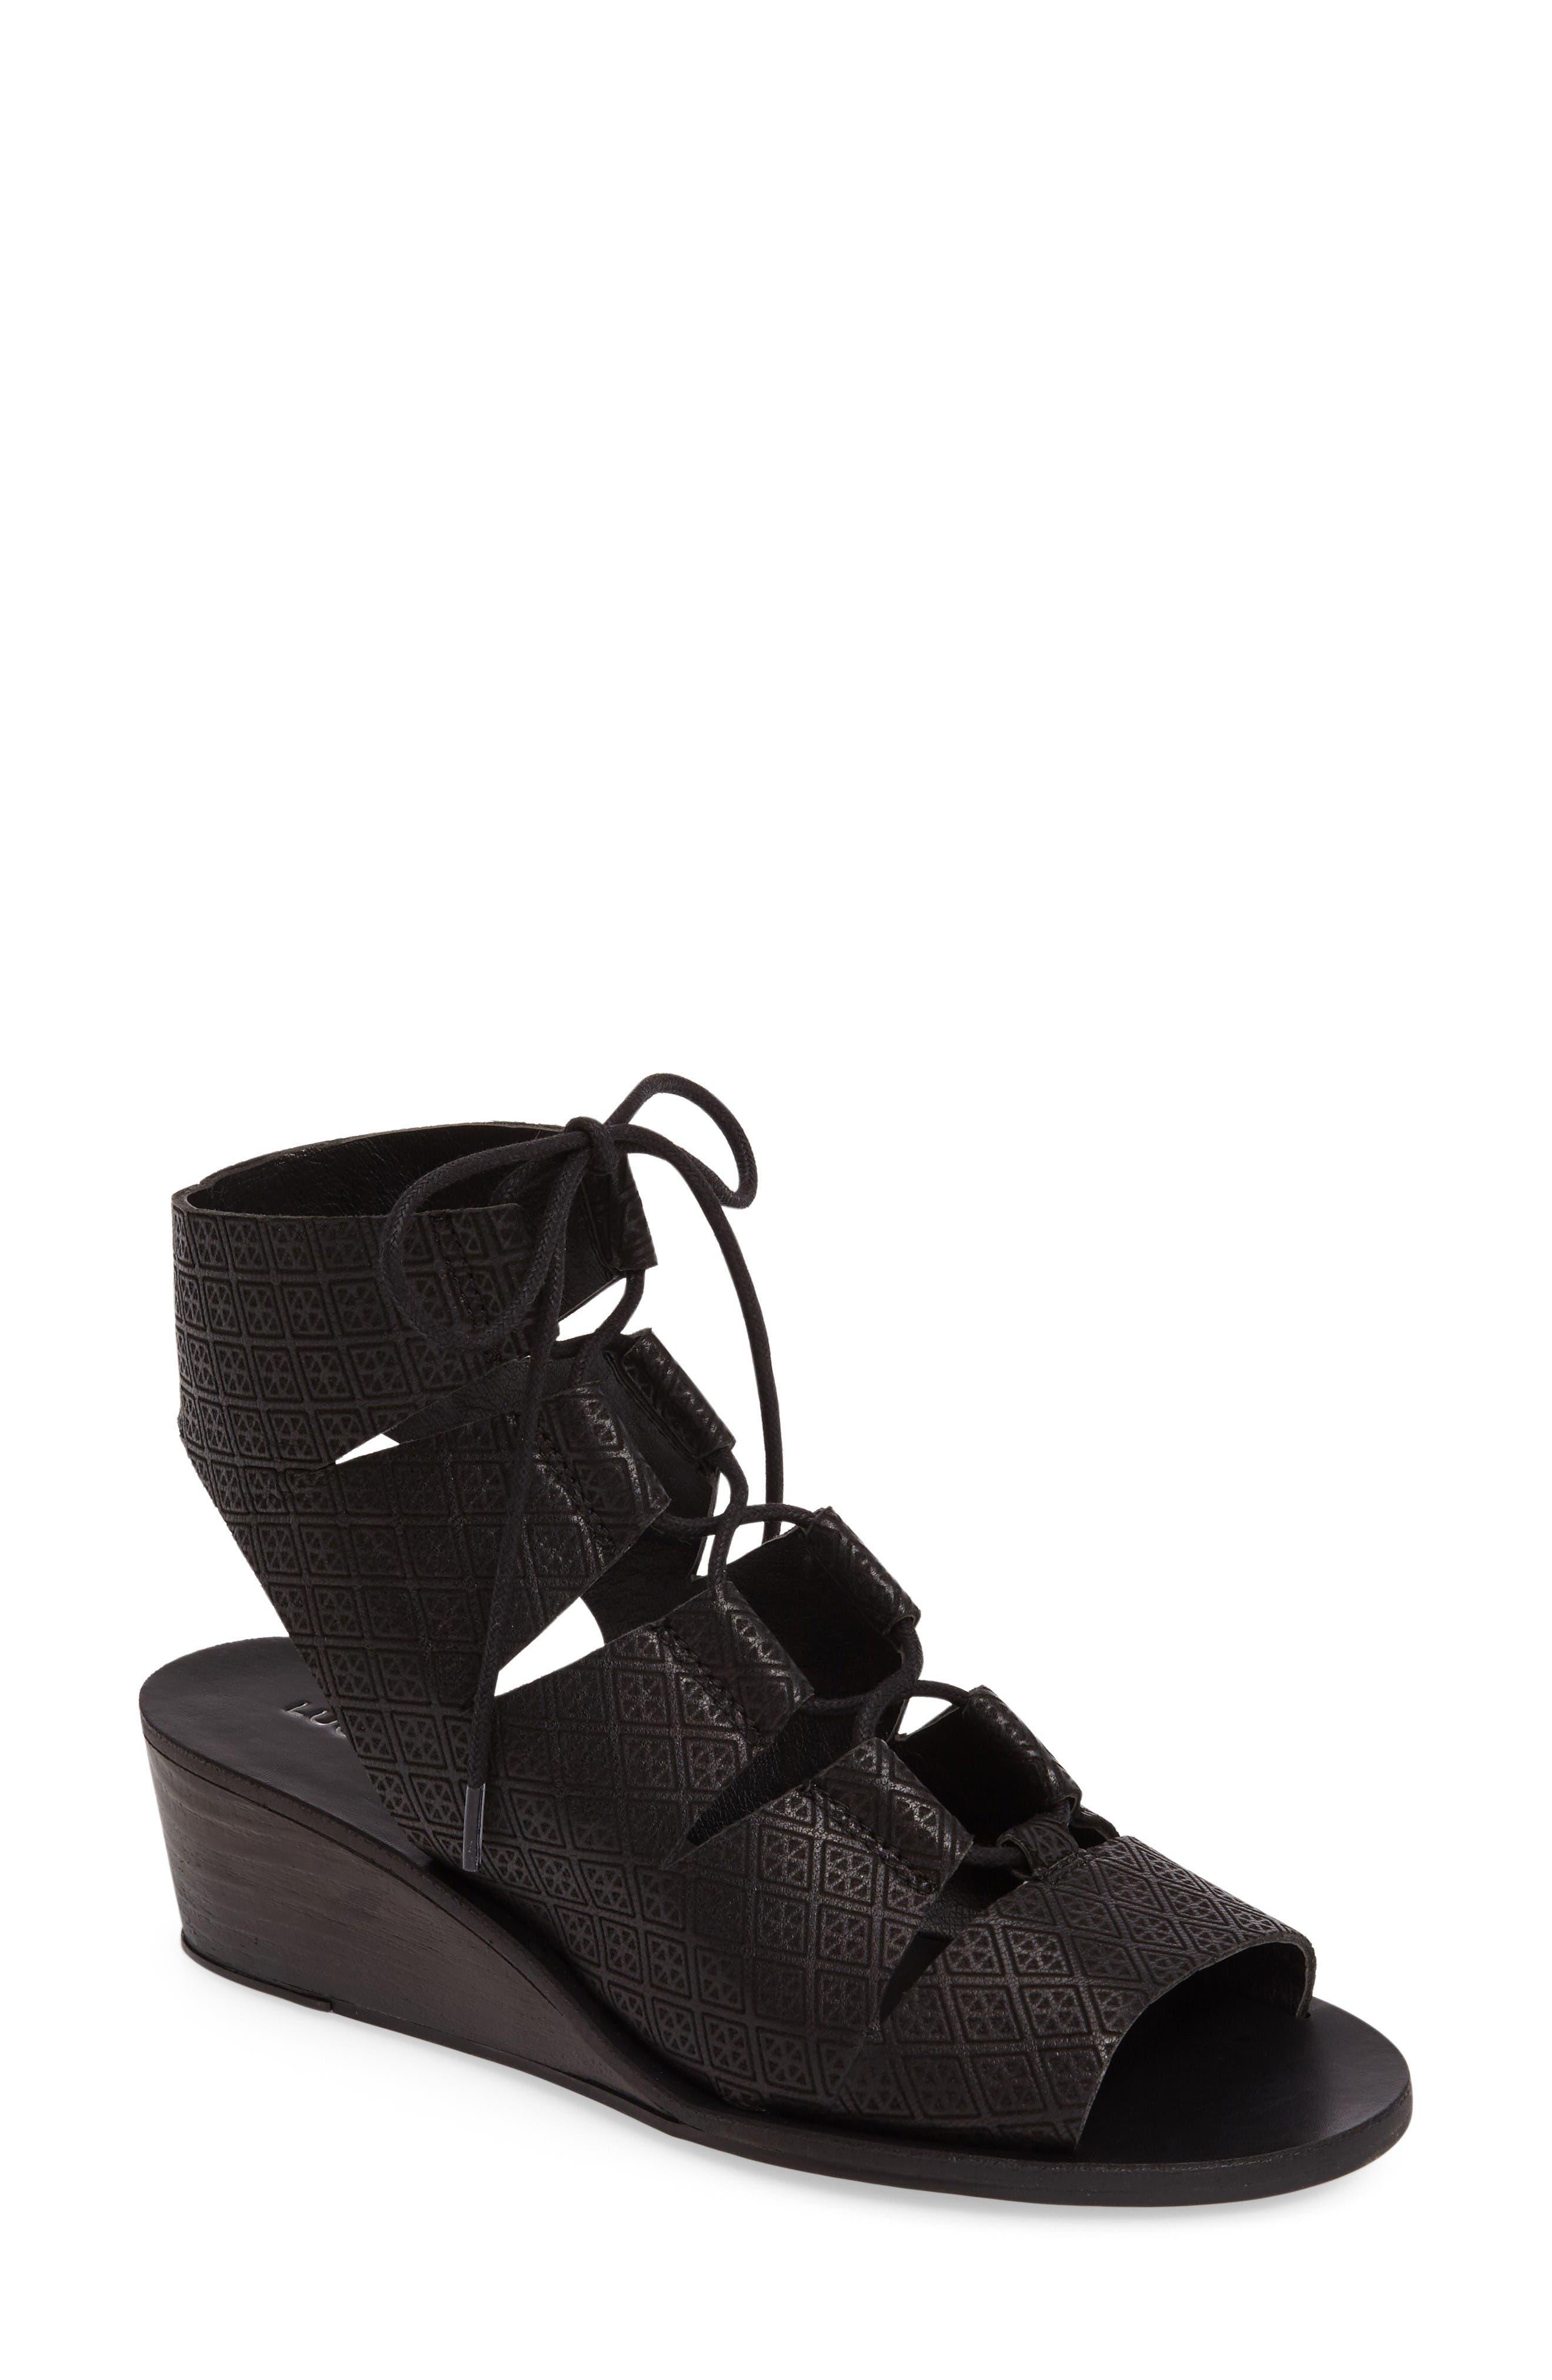 Alternate Image 1 Selected - Lucky Brand Gizi Wedge Sandal (Women)